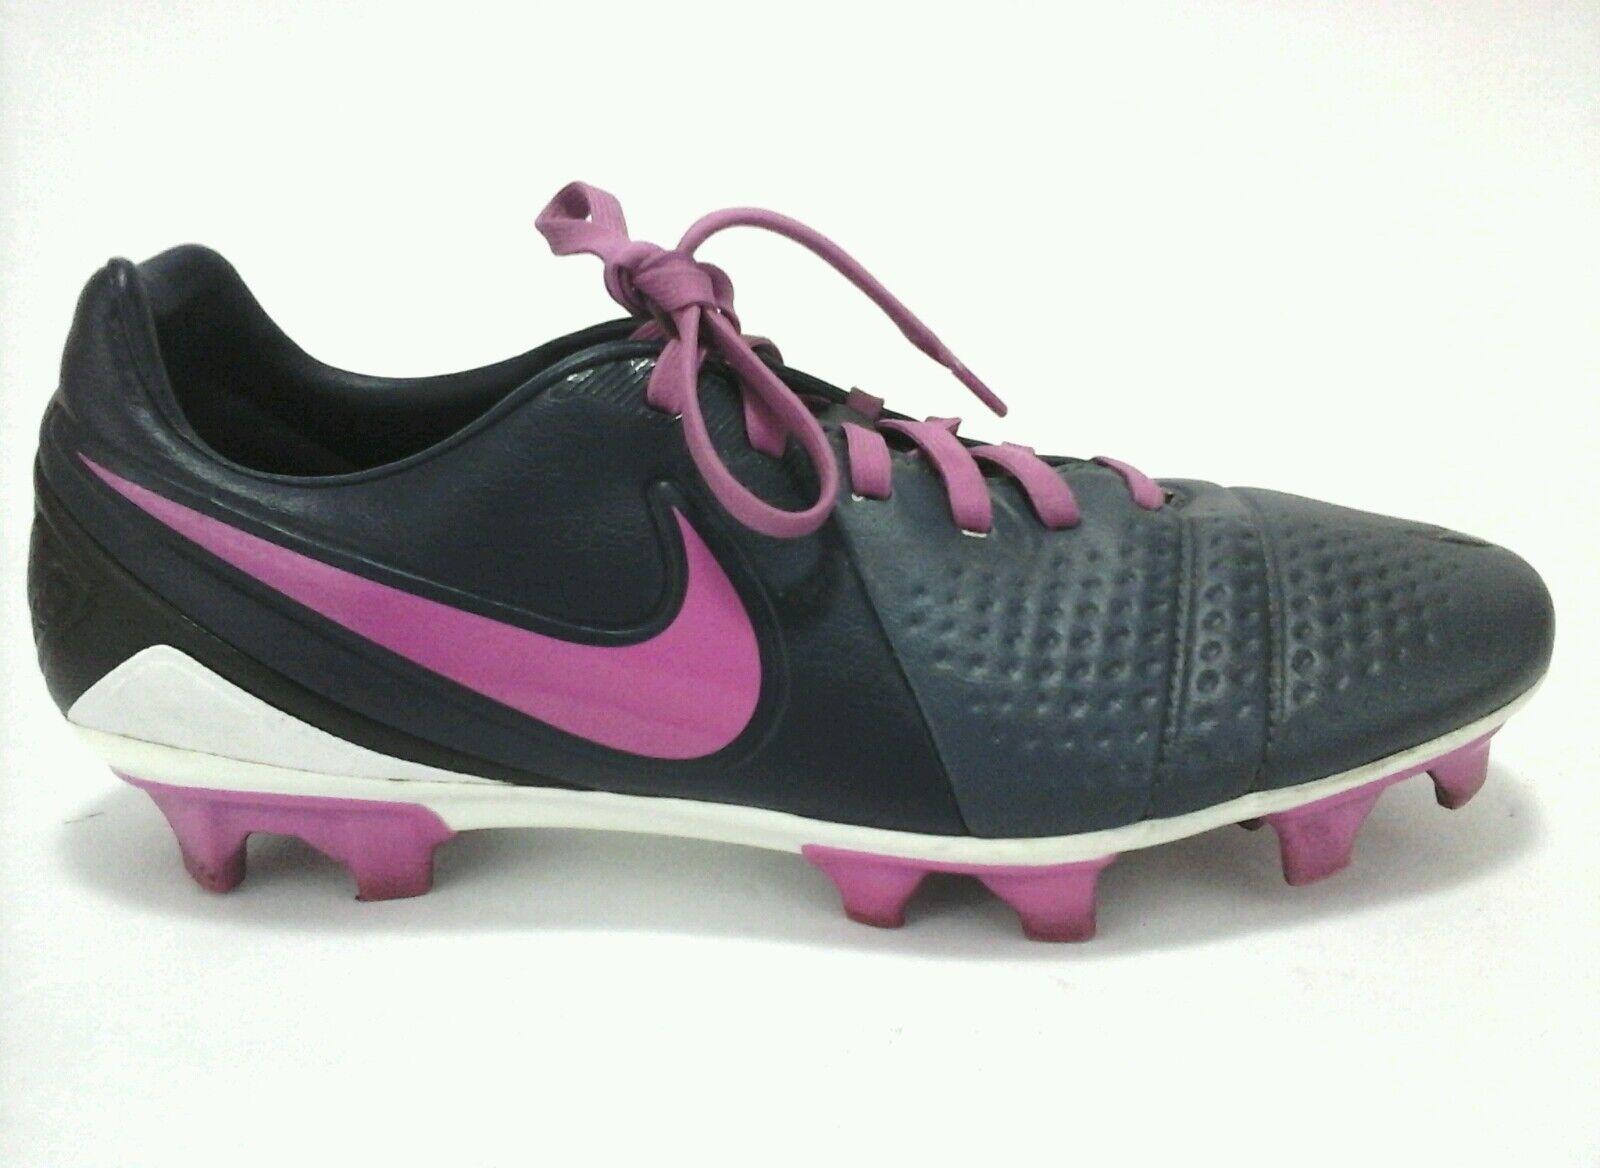 Details about Nike CTR360 Kanga-Lite Soccer Cleats Shoes Gray Pink US 7.5  EU 38.5 EUC